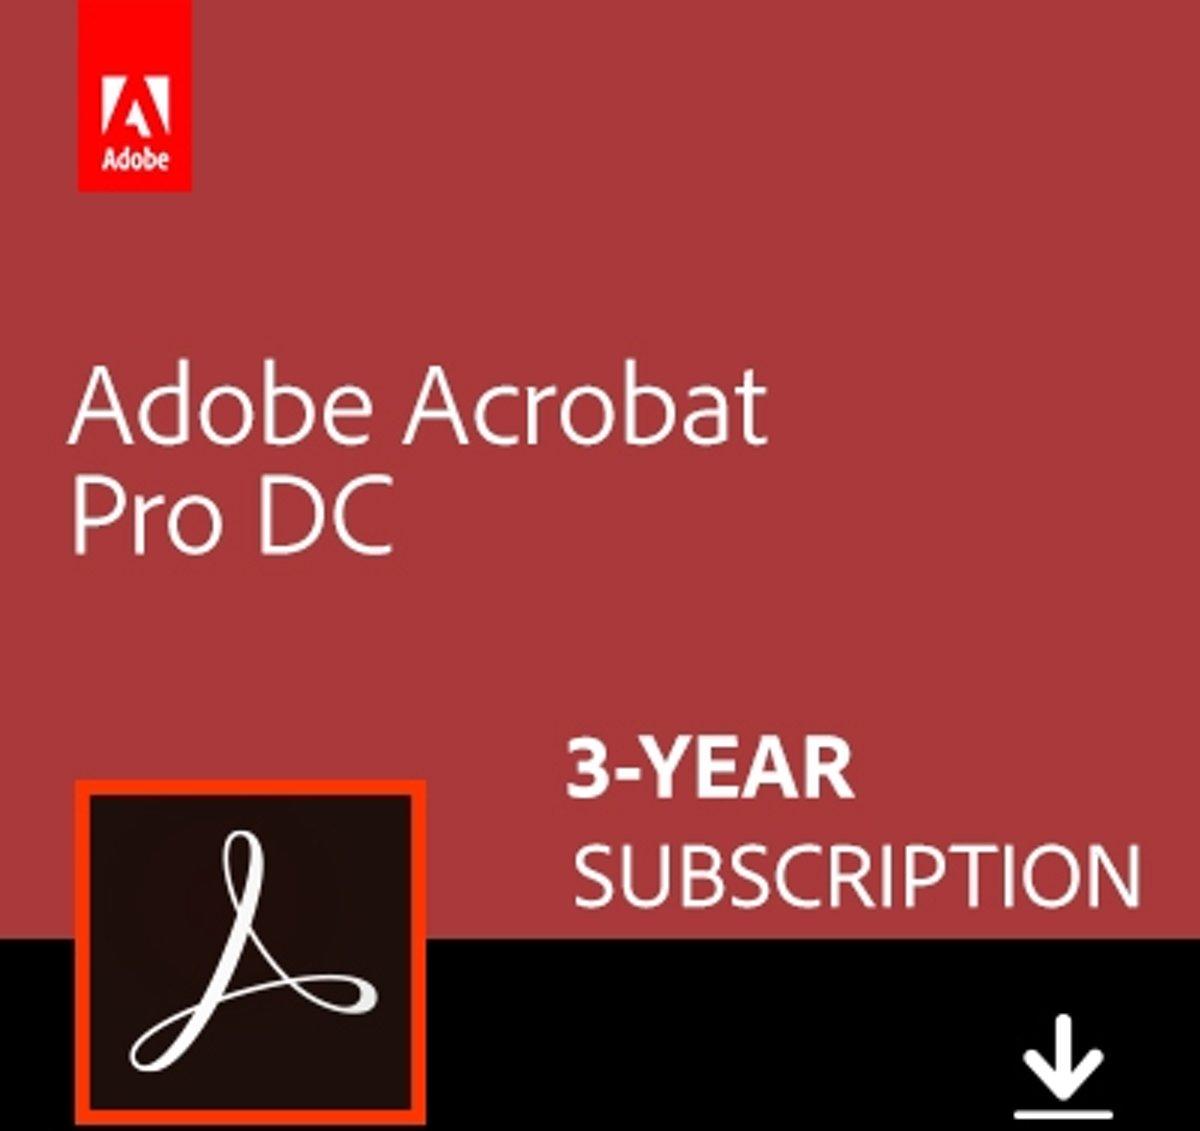 Index of /images/Adobe